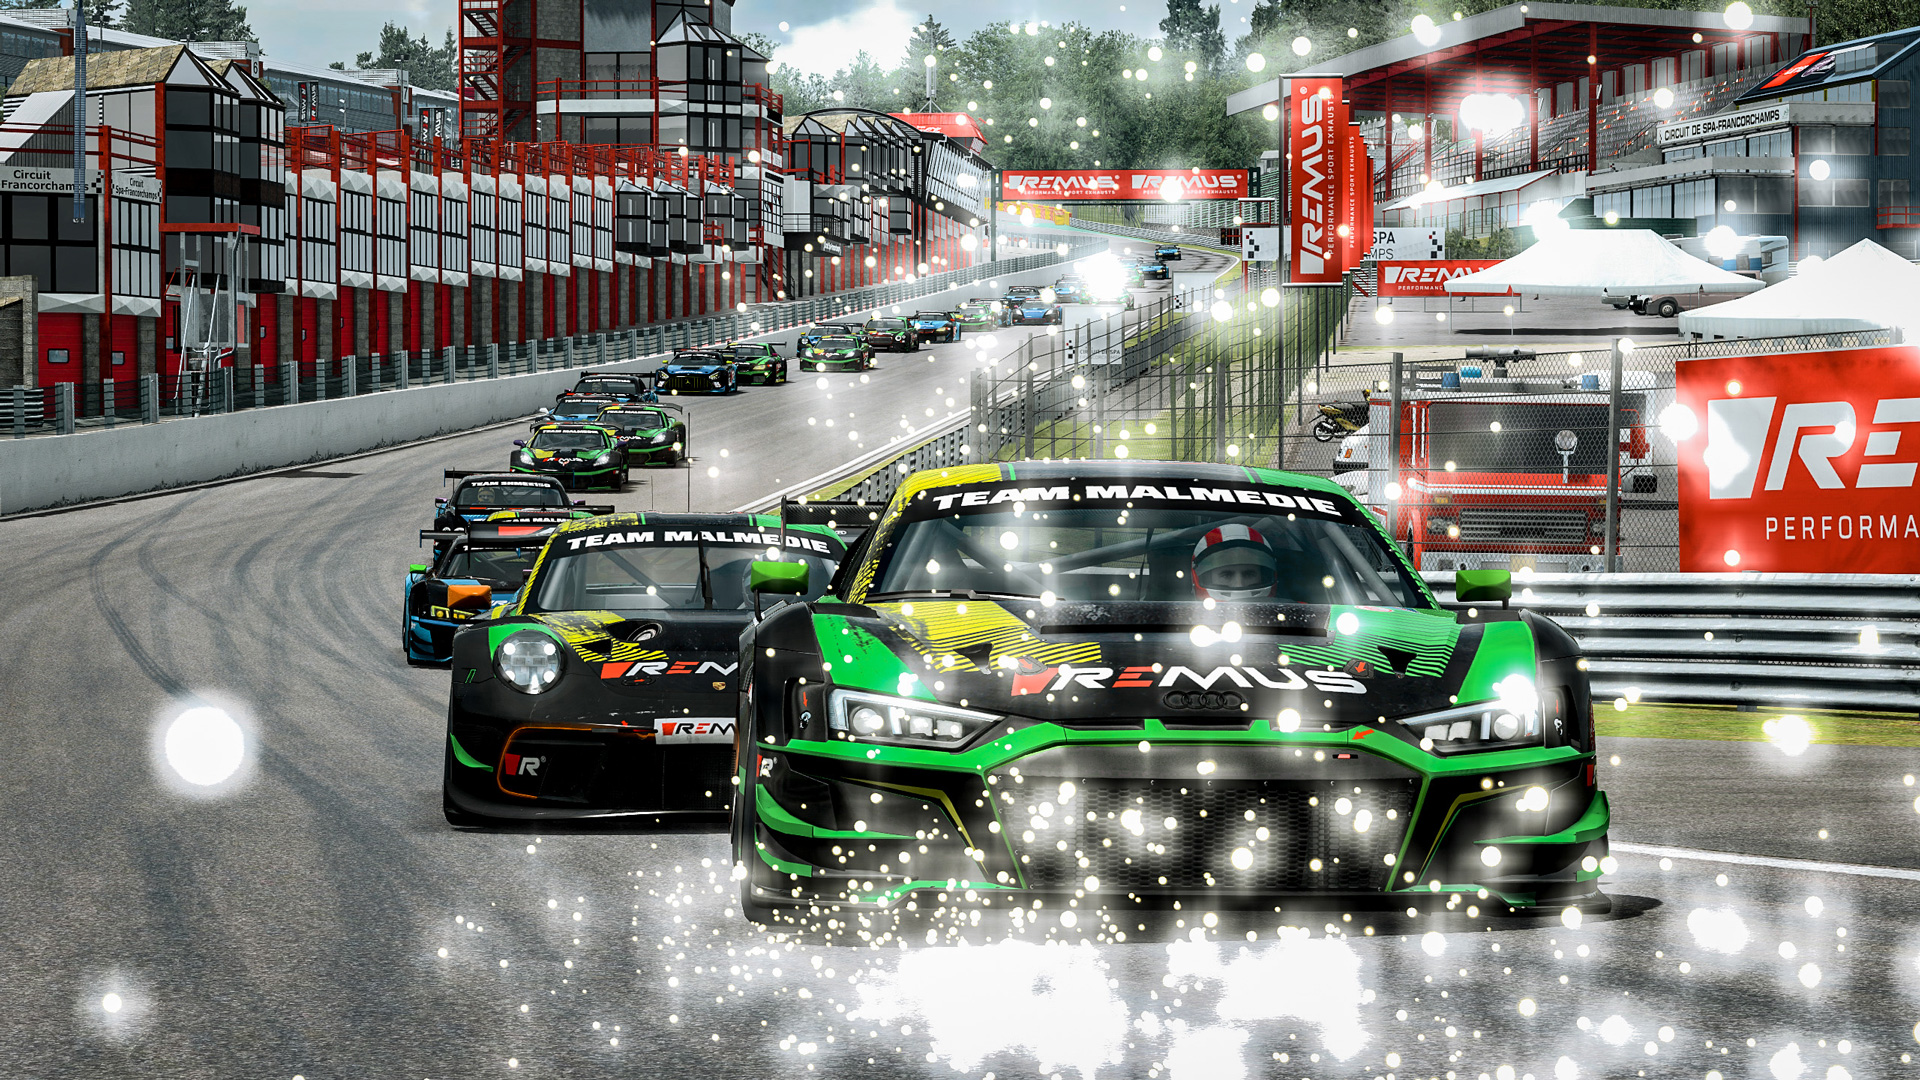 LET THE RACE BEGIN